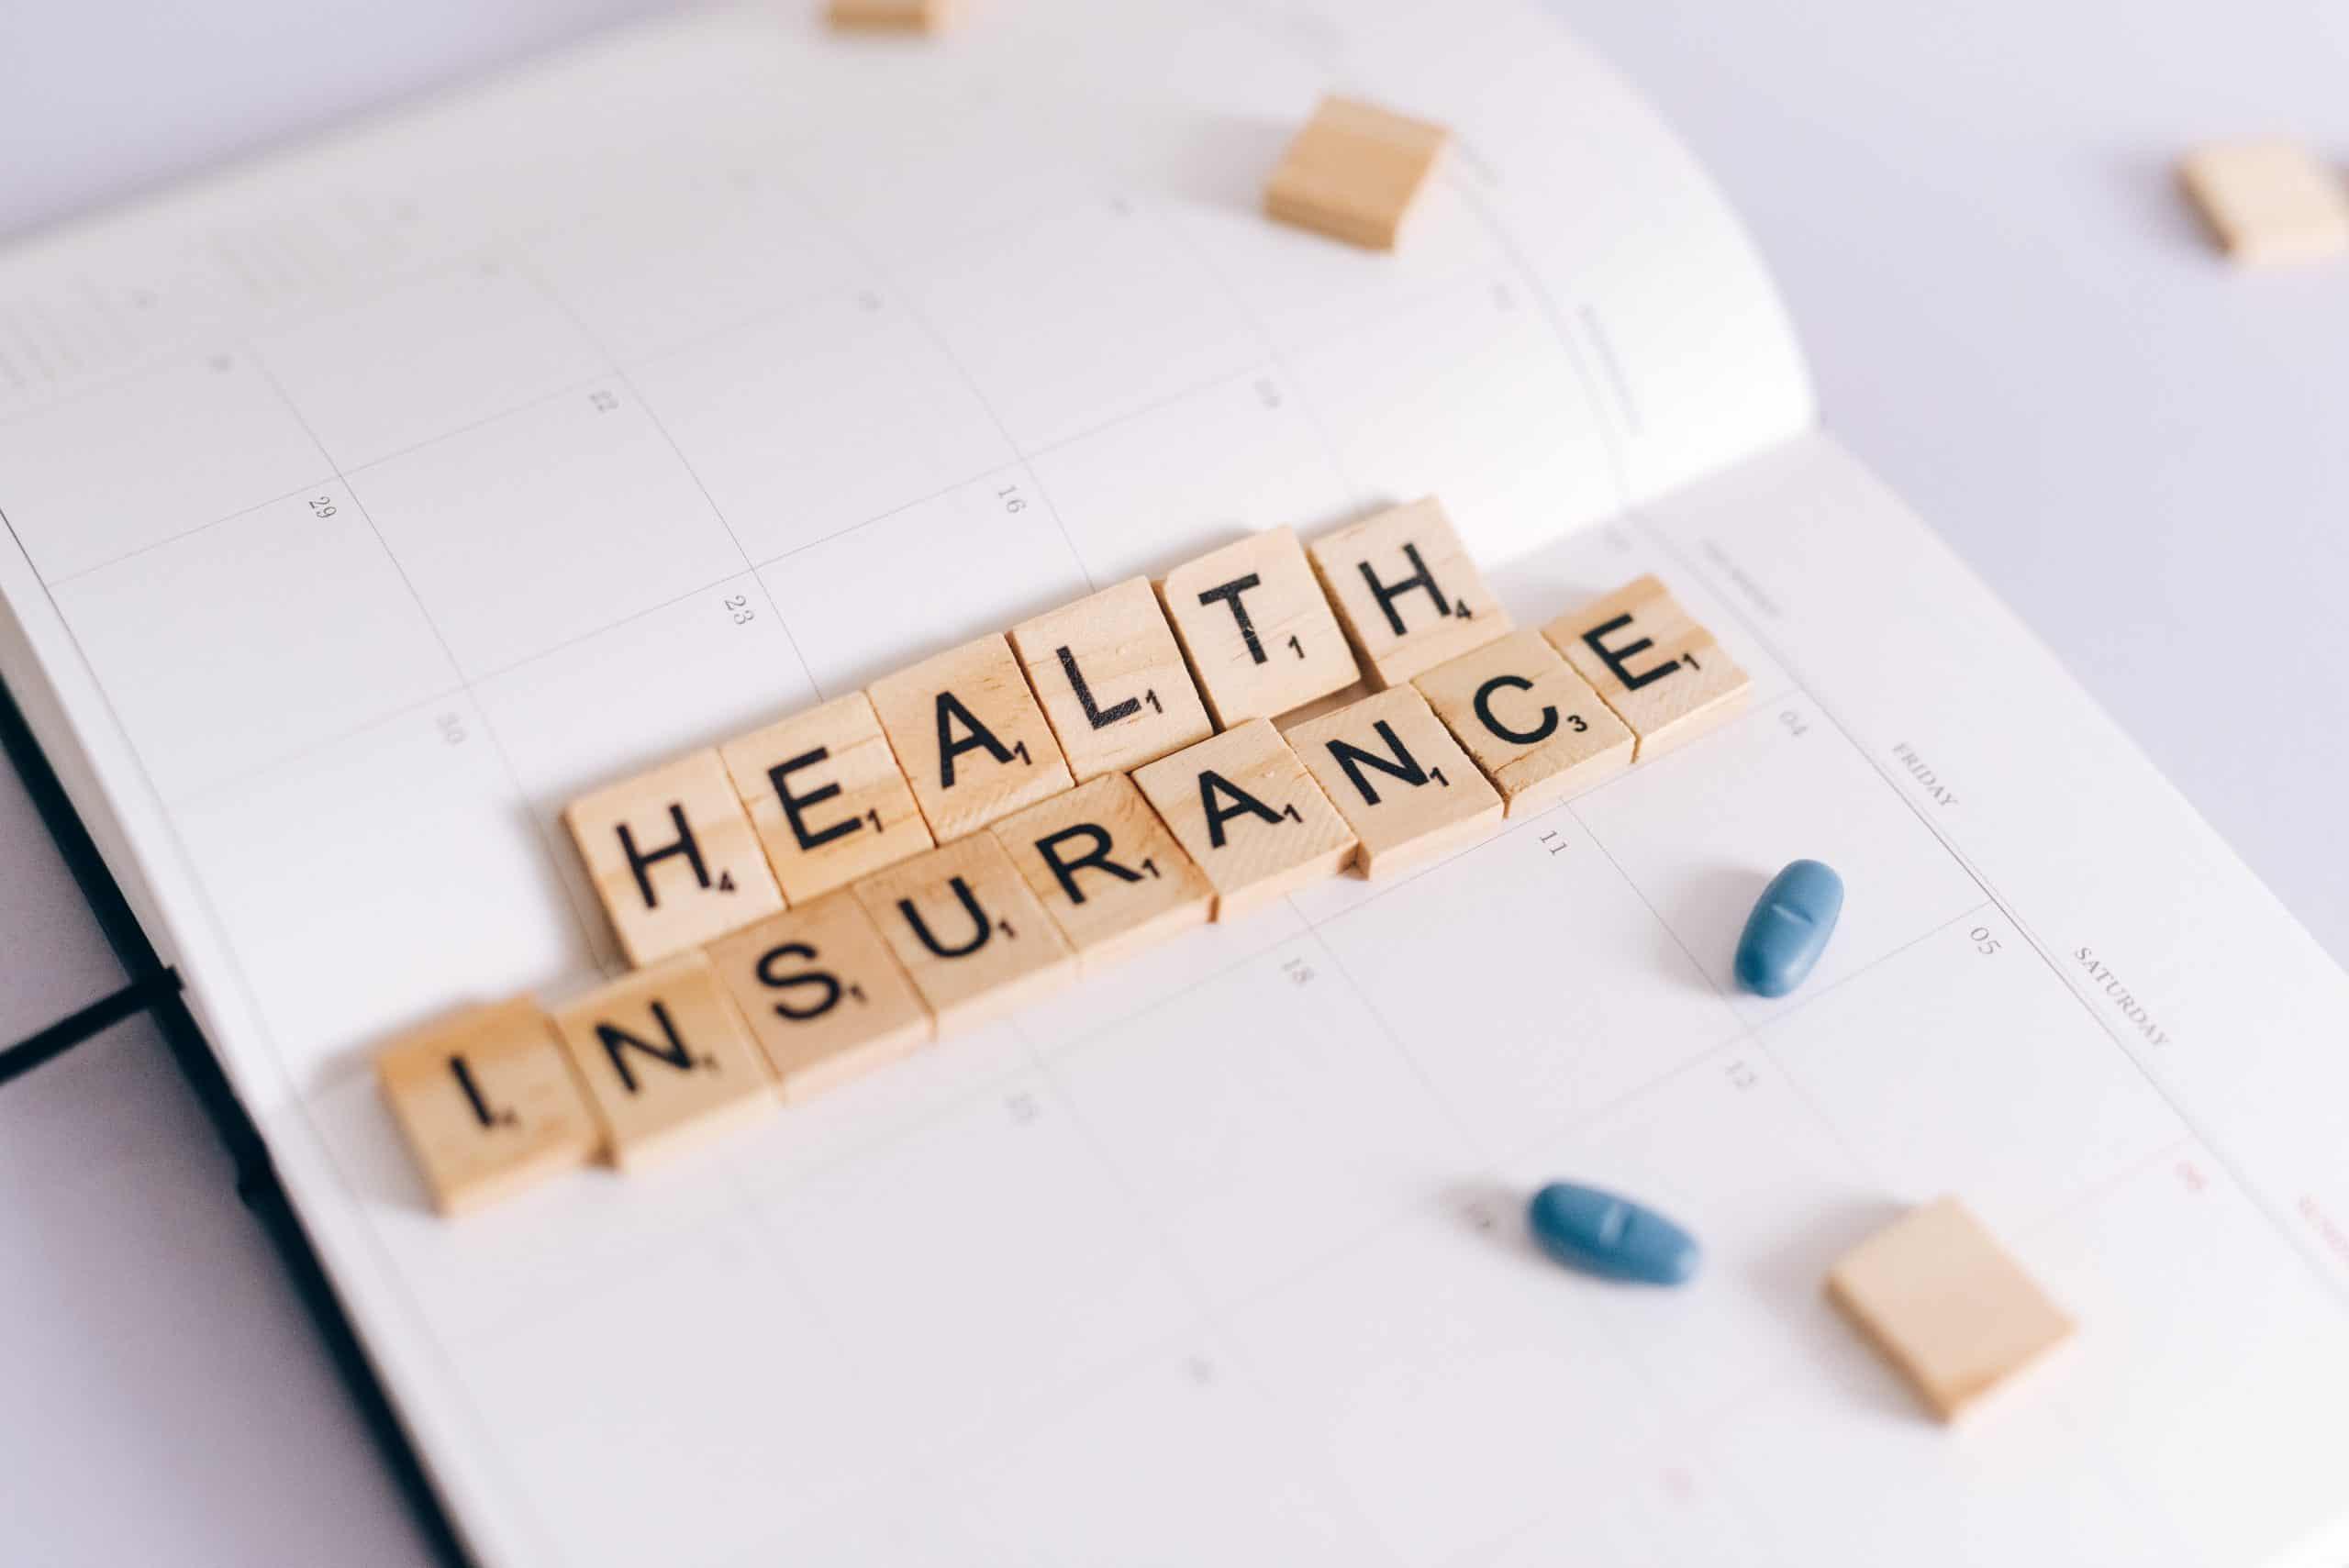 group term health insurance